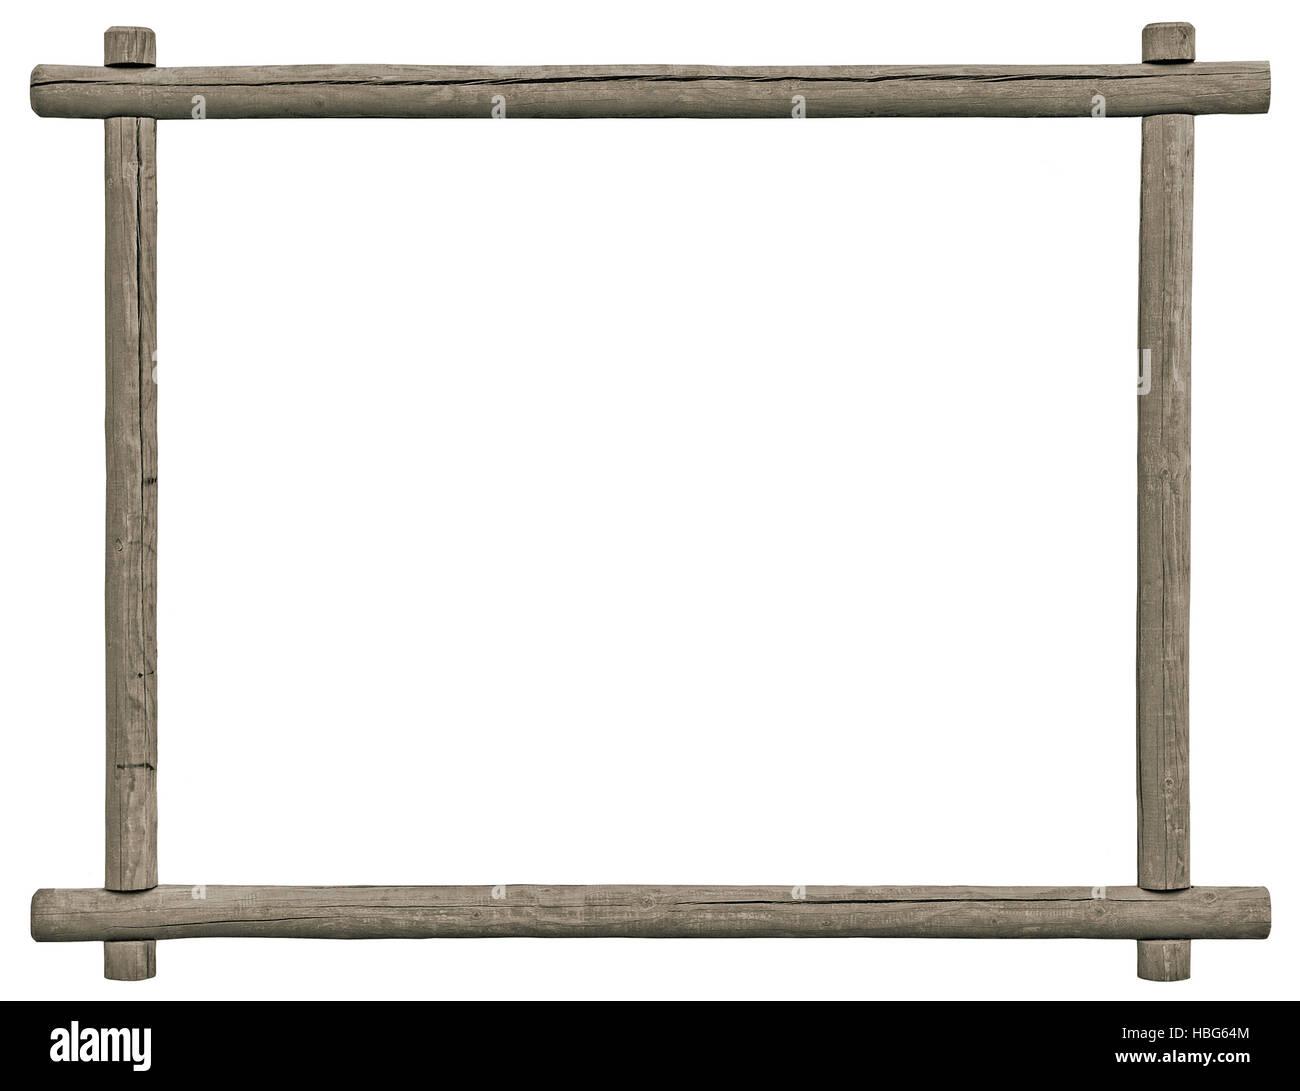 Wood Framing Stockfotos & Wood Framing Bilder - Alamy